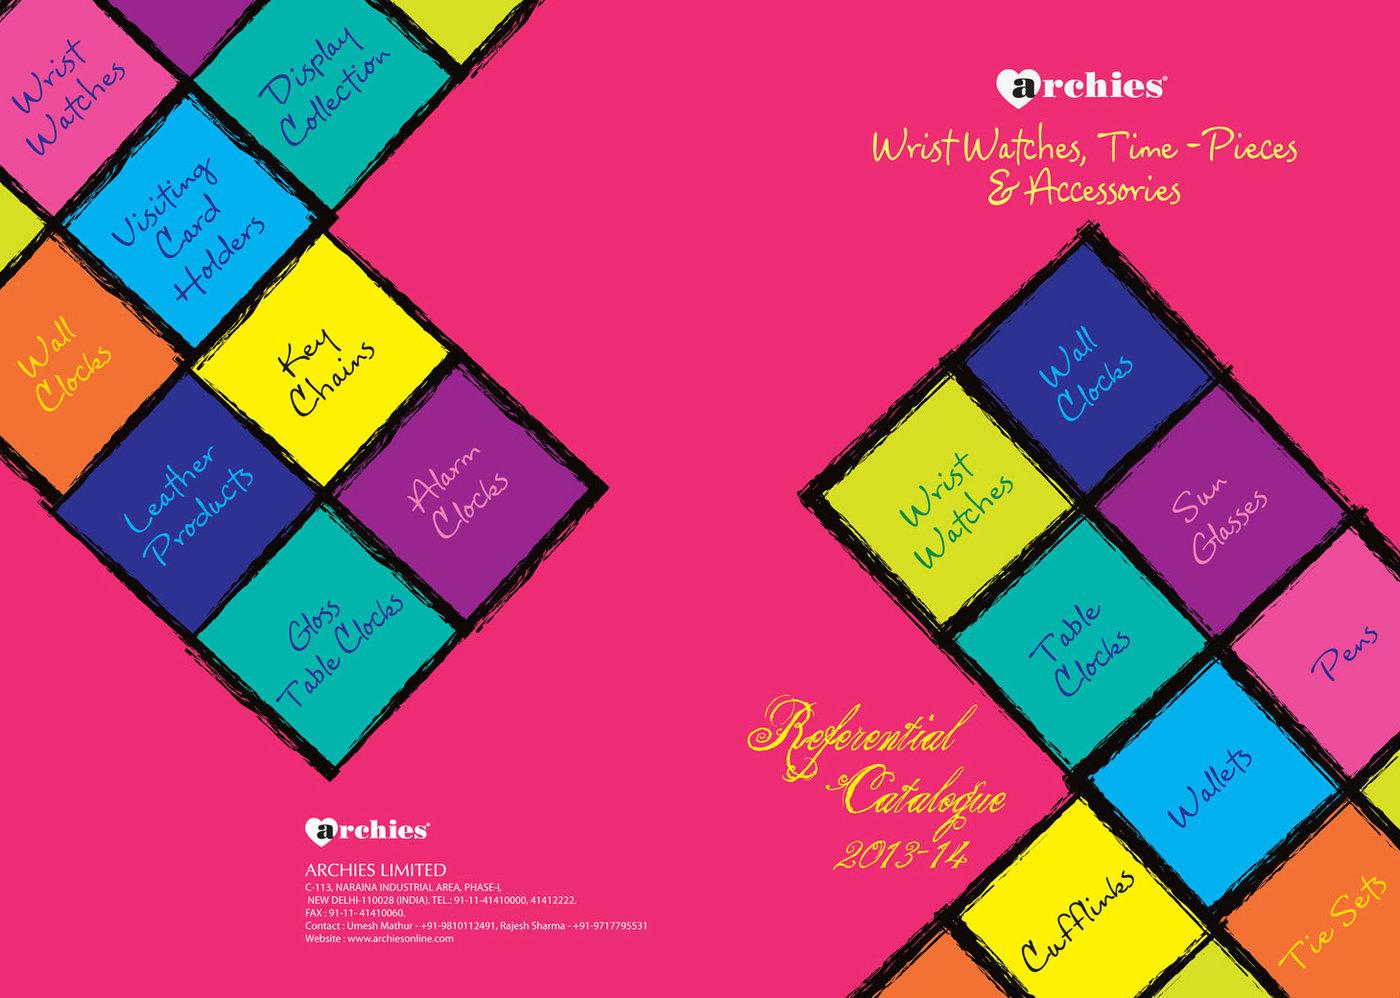 Catalogue & Product Shoot by PARVINDER SINGH at Coroflot com